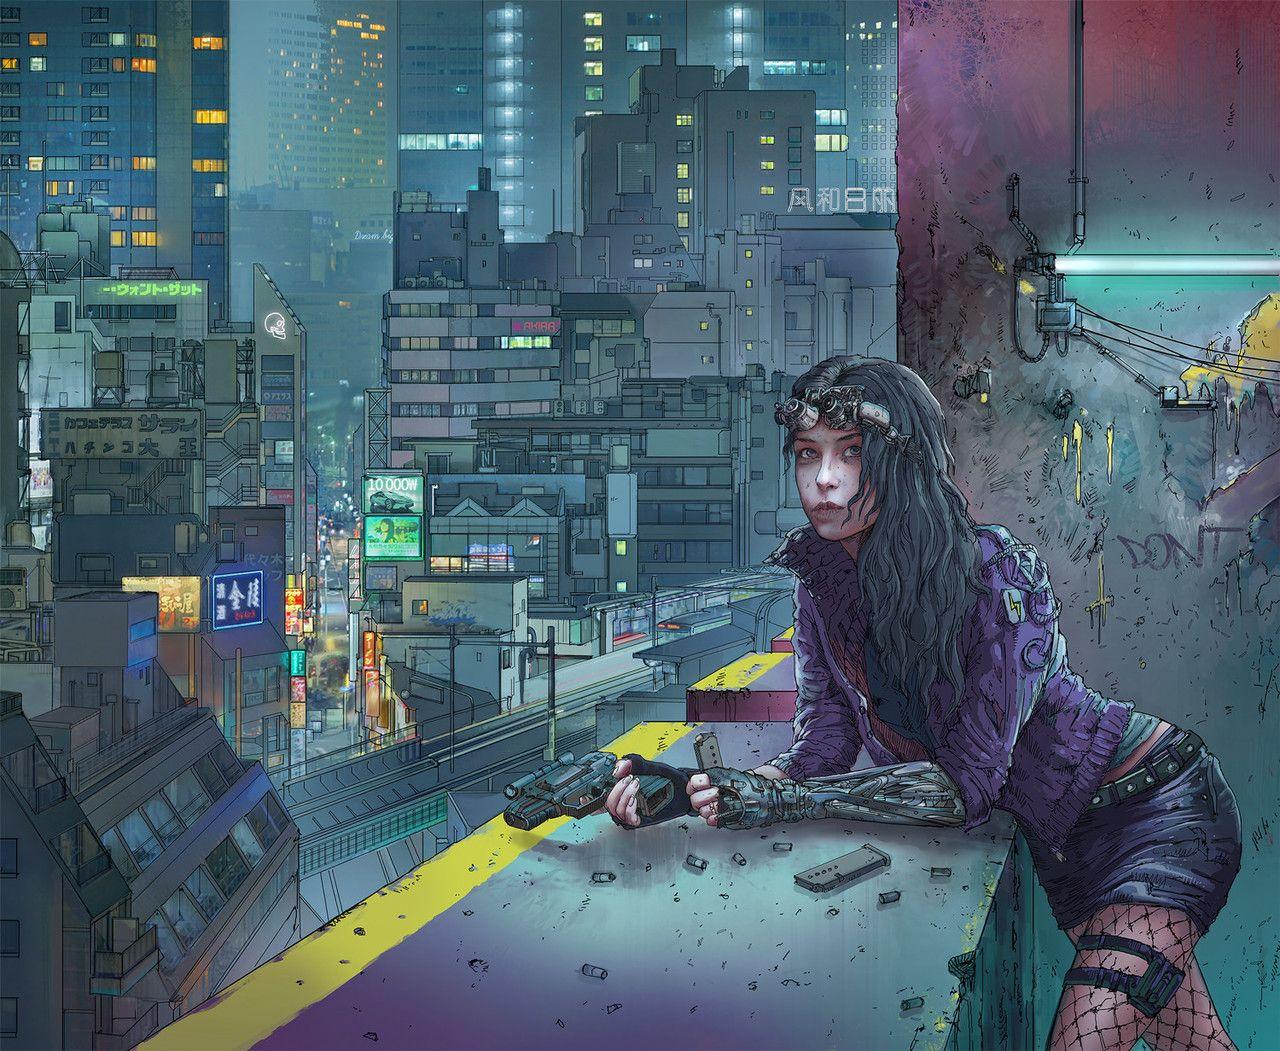 Art And Things Cyberpunk Anime Cyberpunk Aesthetic